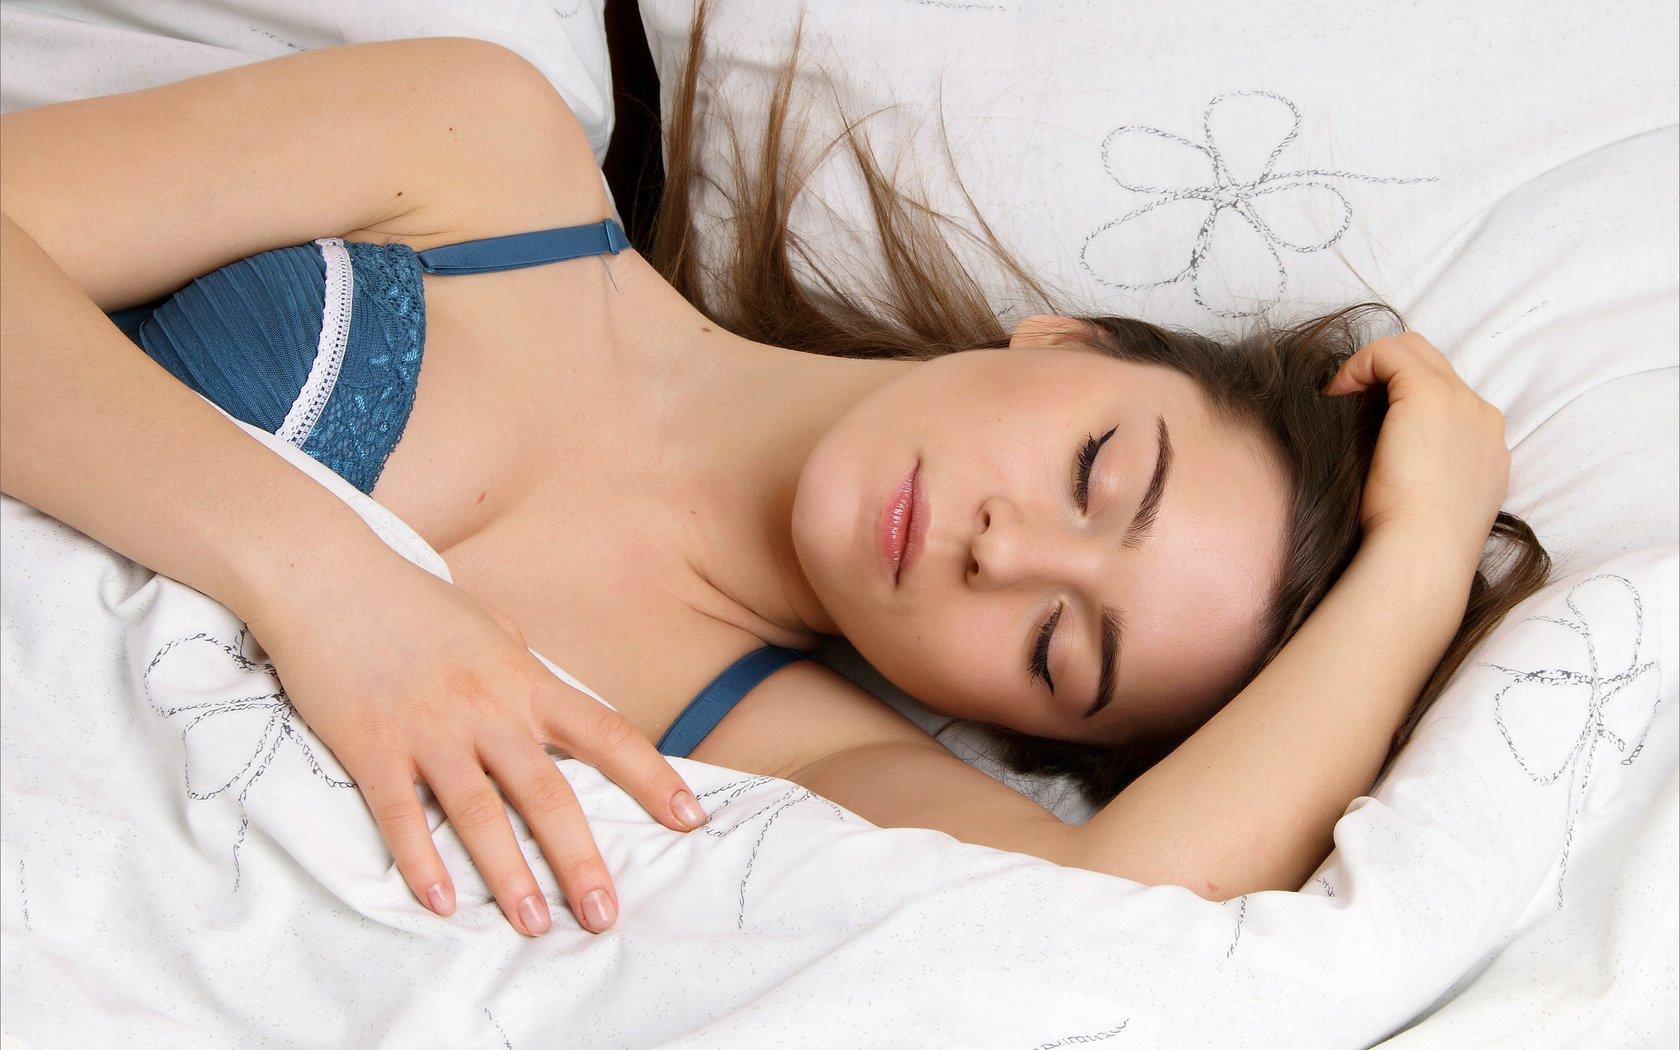 женщина красиво спит